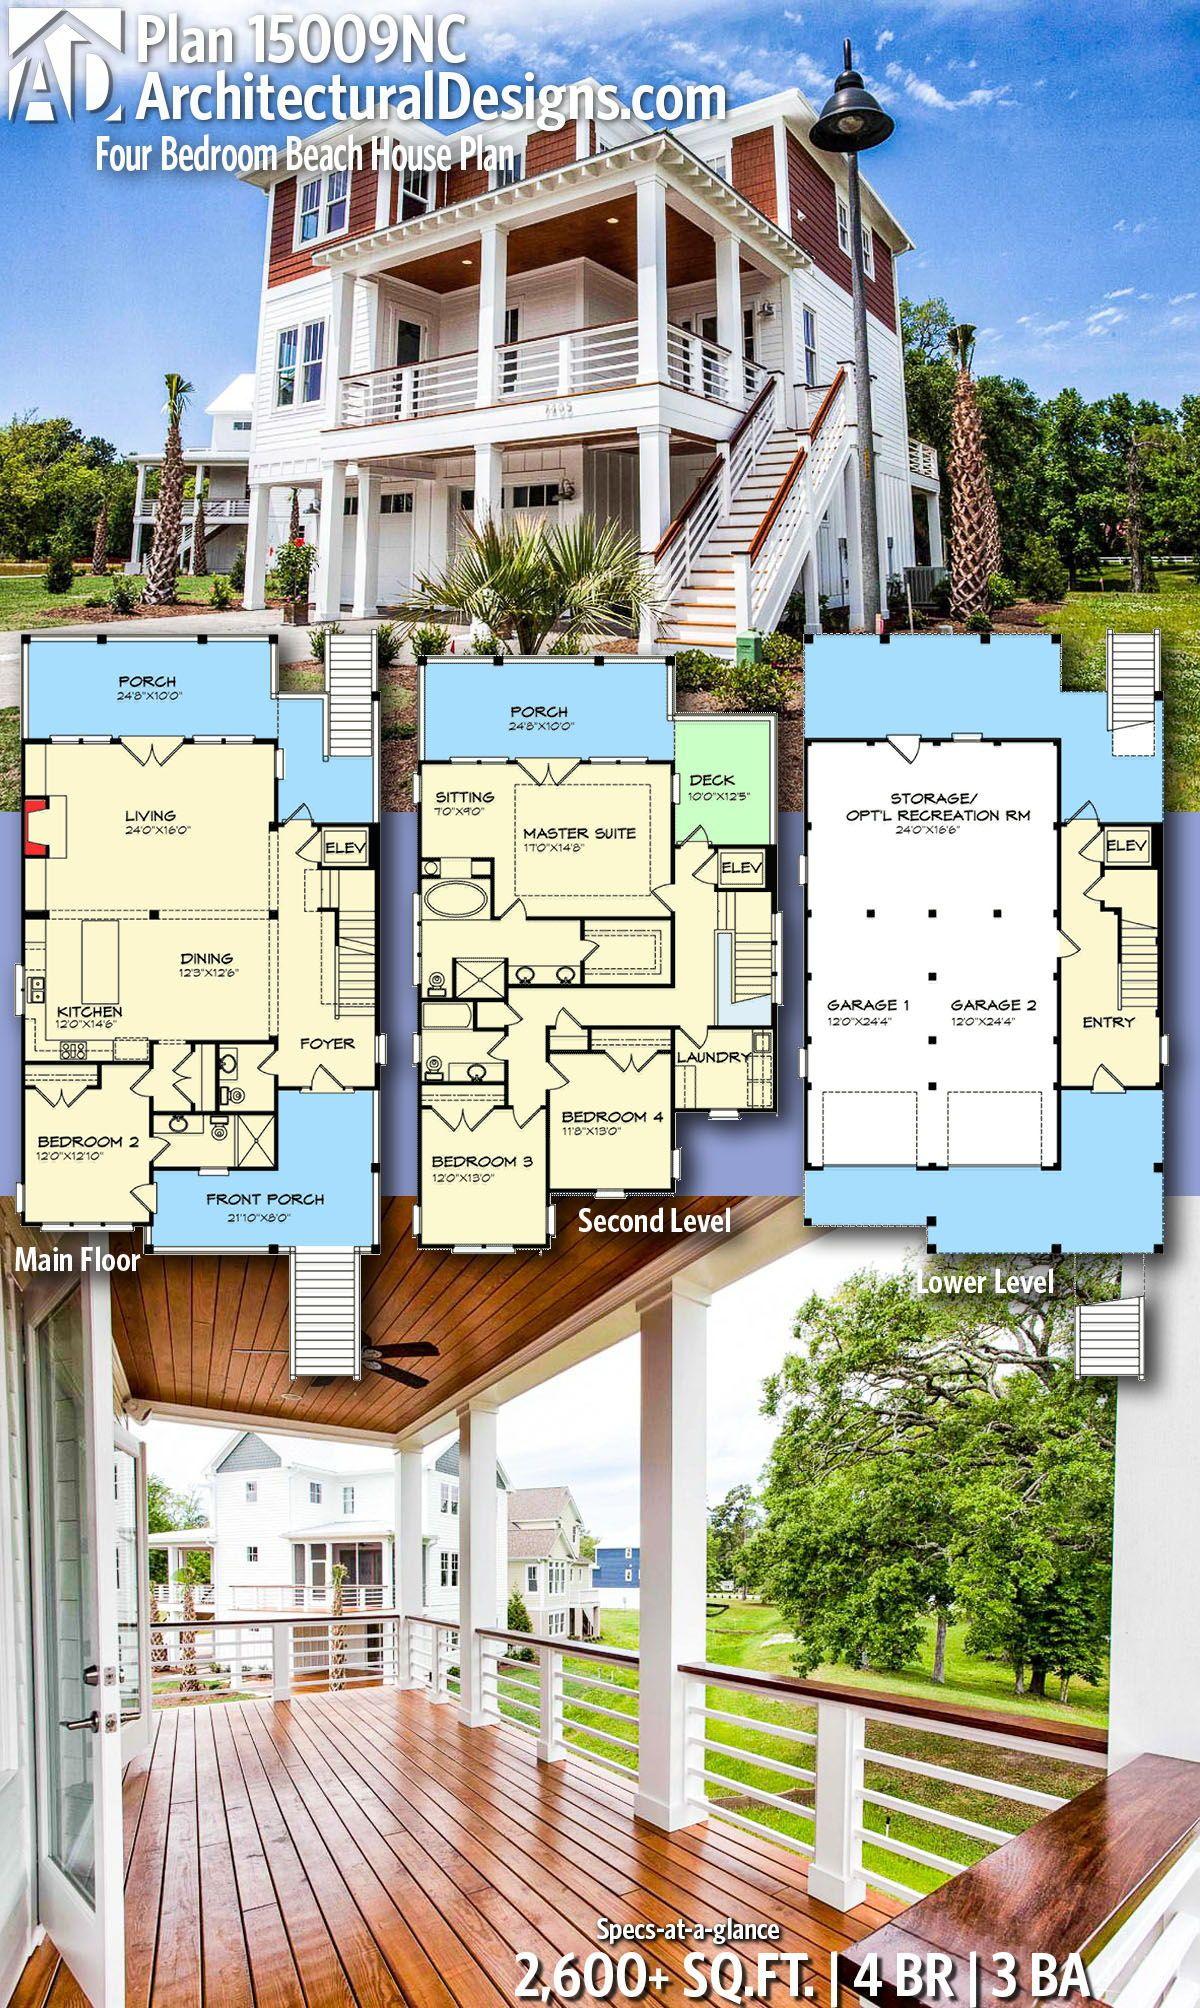 Plan 15009nc Four Bedroom Beach House Plan Beach House Floor Plans Beach House Plan Coastal House Plans